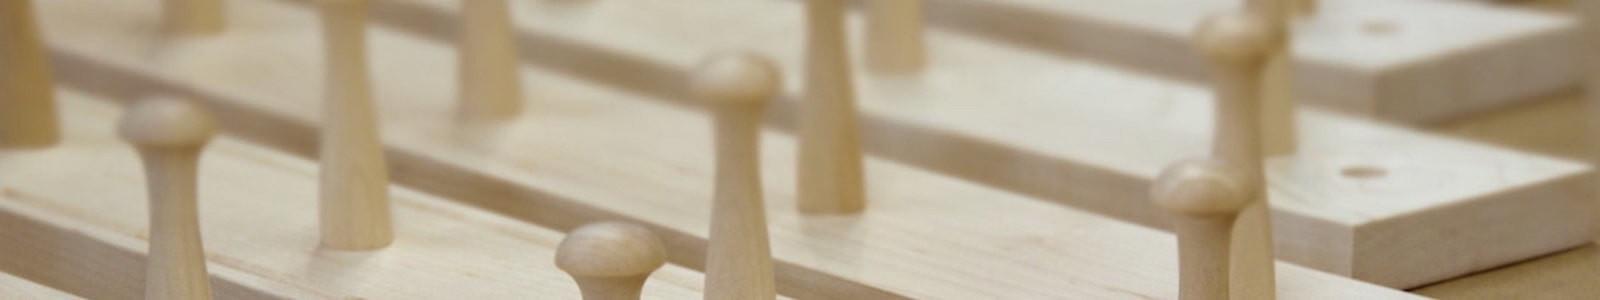 Shaker Peg Racks & Rails